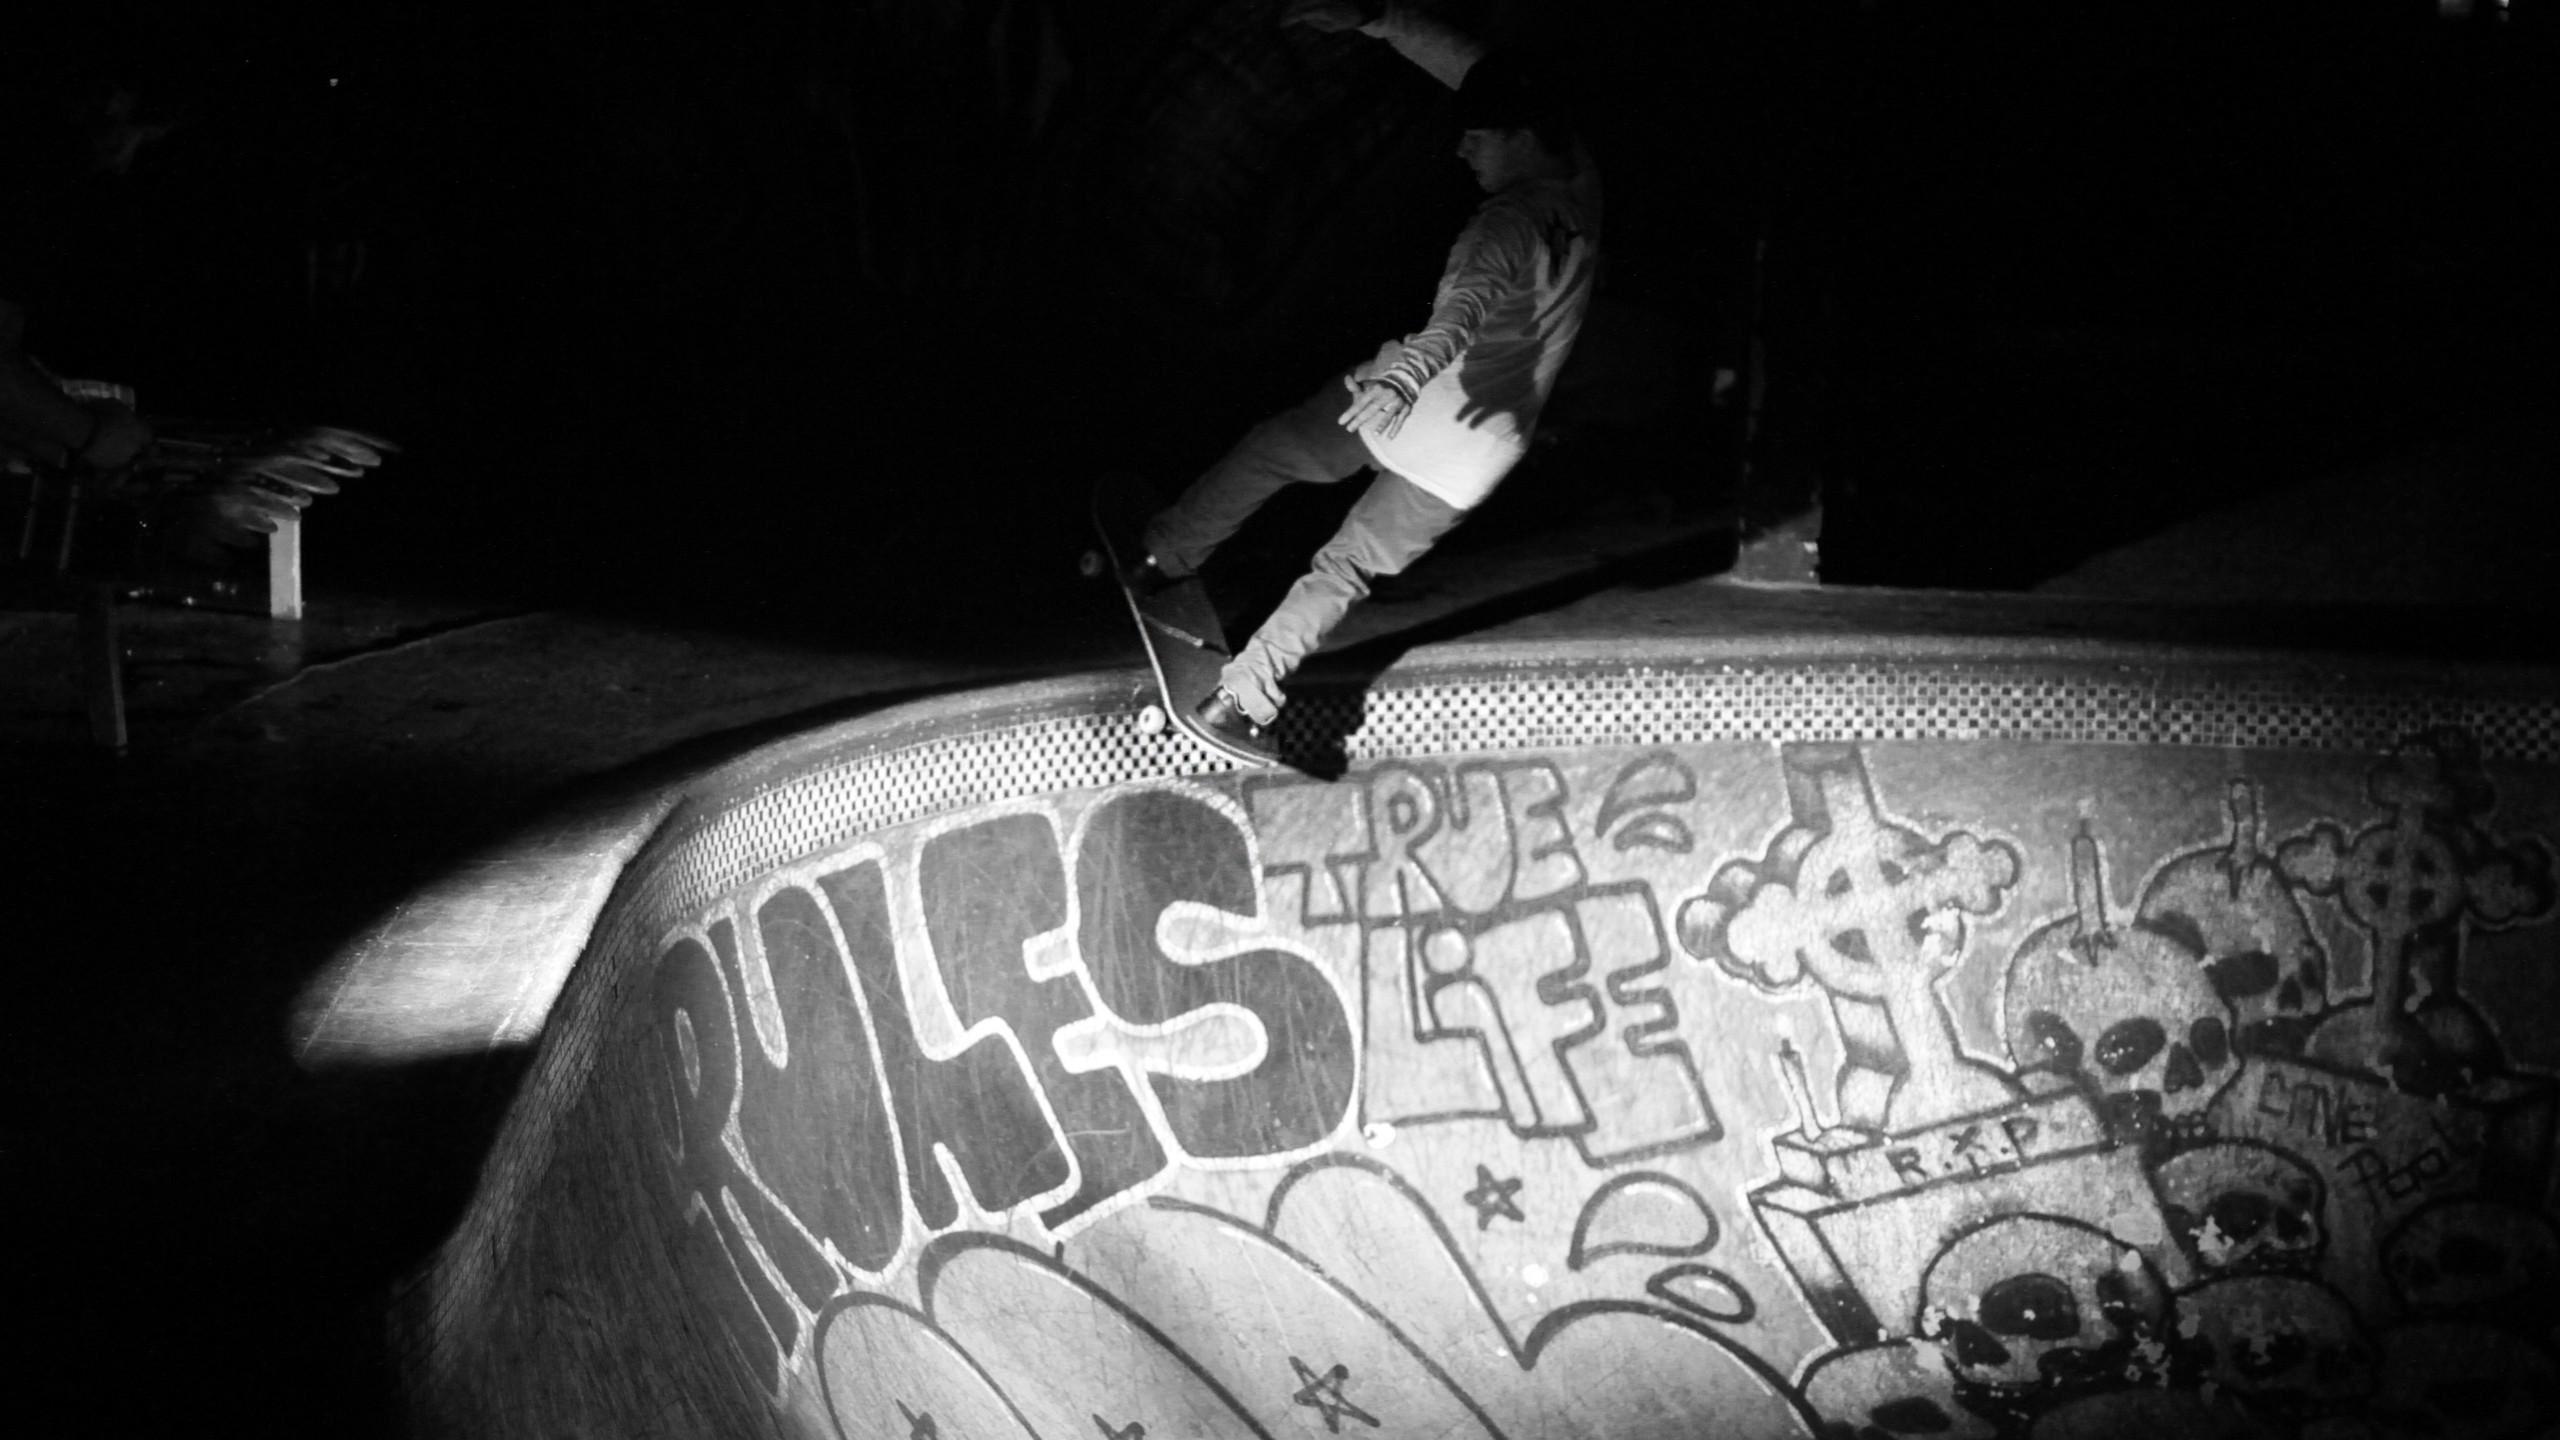 Luiz - Fs Rockslide